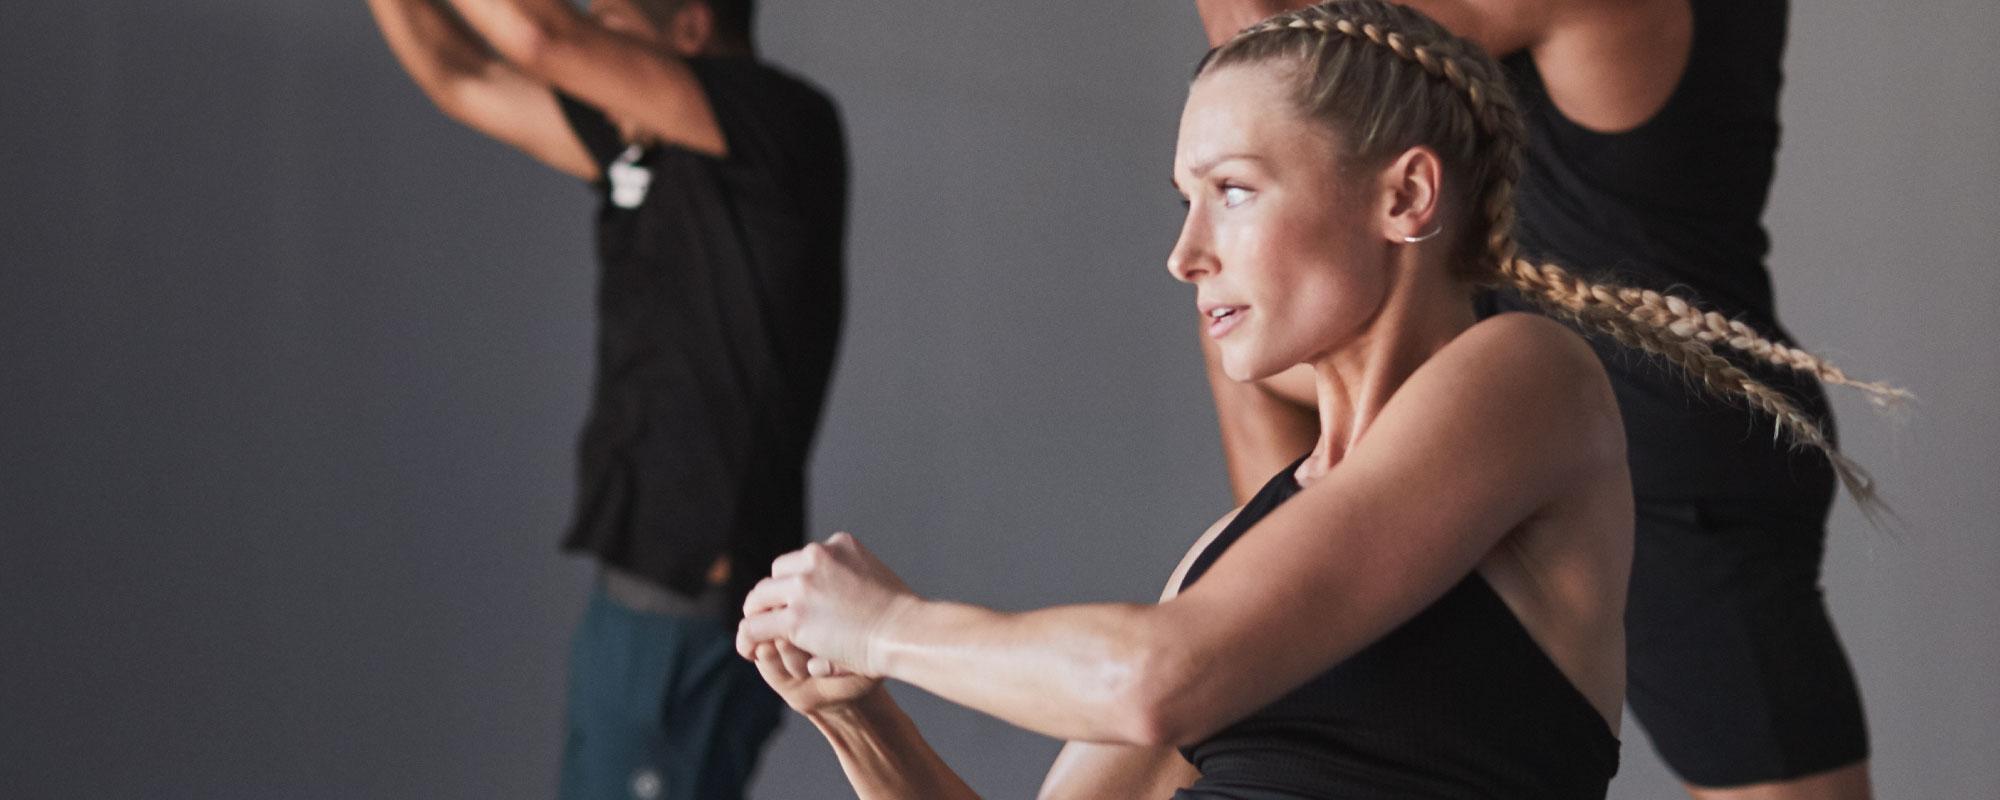 edukacija body combat